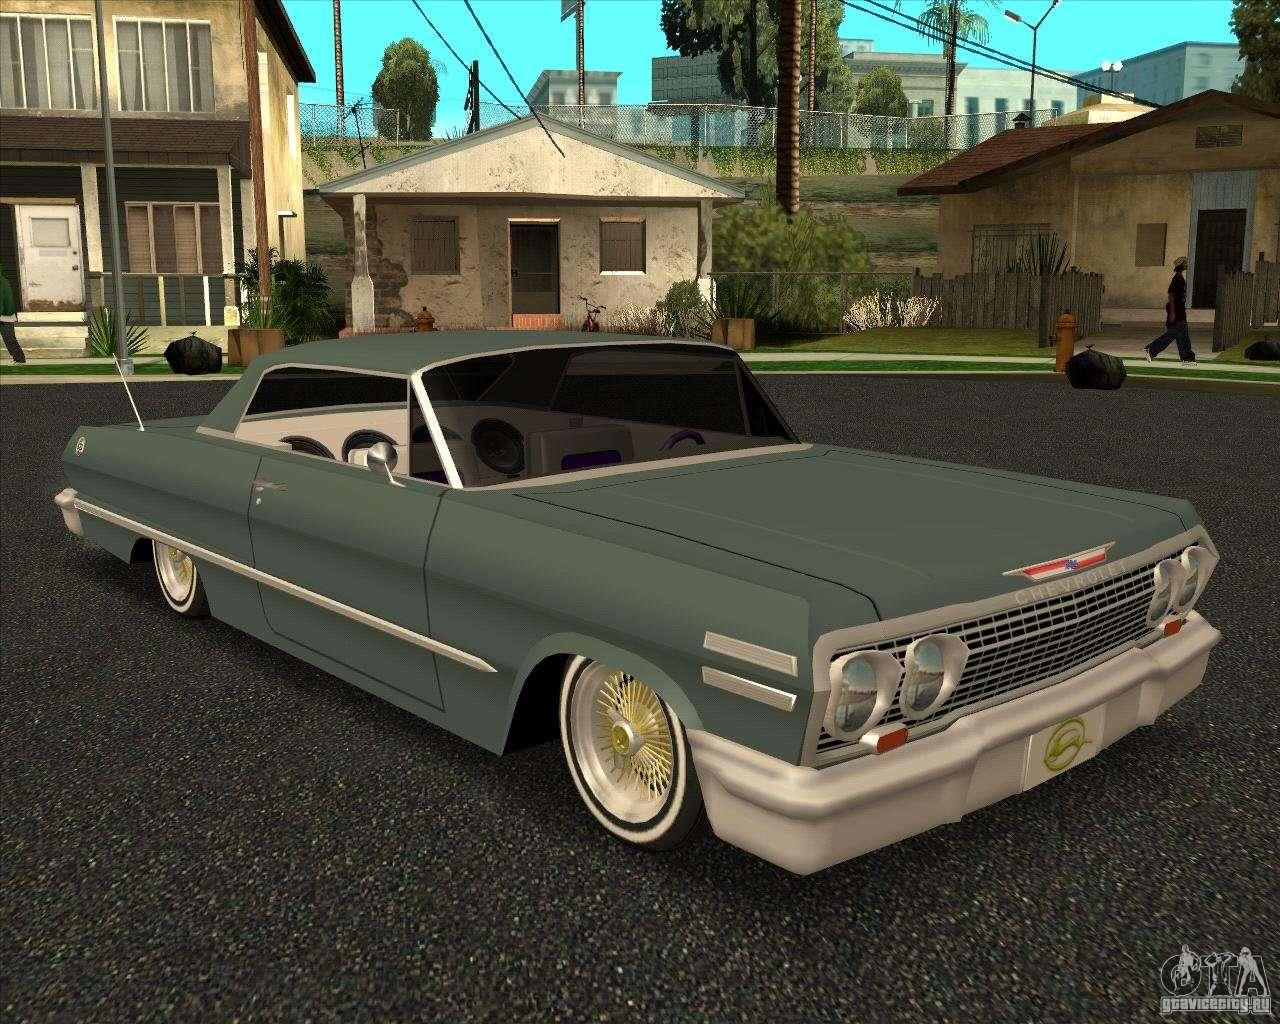 Chevrolet impala 4 door hardtop 1963 for gta san andreas - Chevrolet Impala 4 Door Hardtop 1963 For Gta San Andreas 57